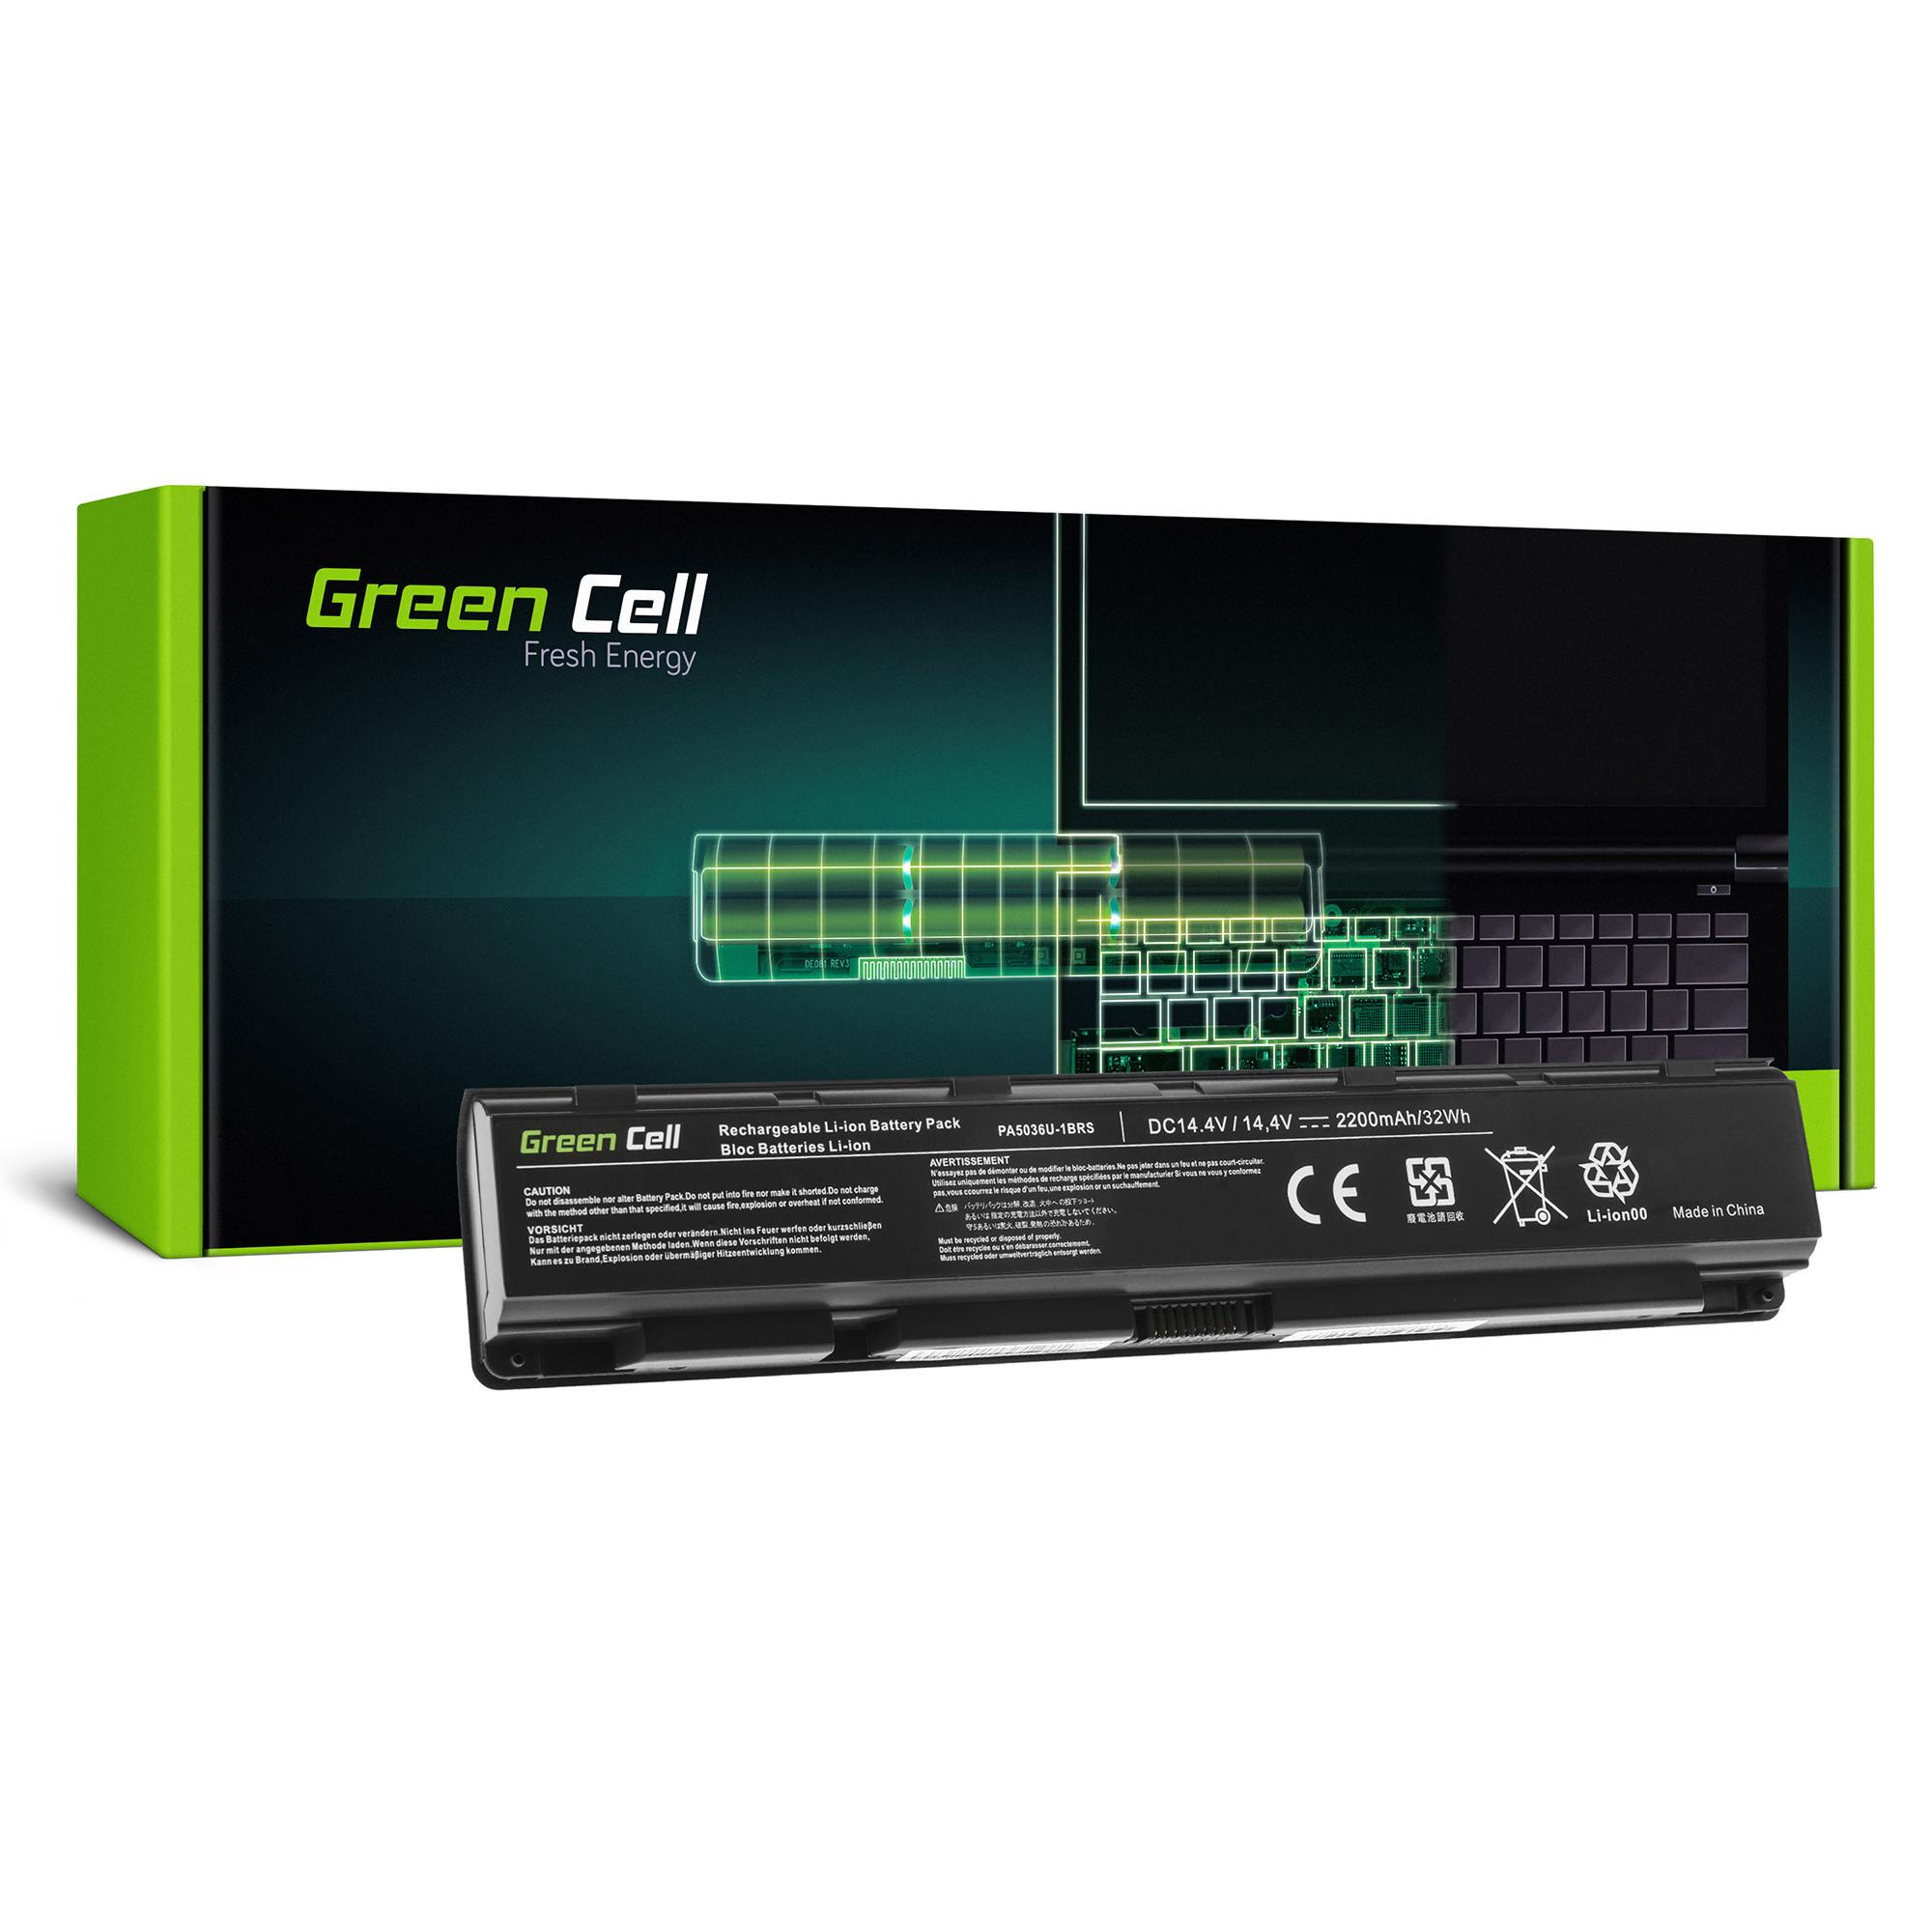 Green Cell TS63 Baterie Toshiba PA5036U-1BRS PABAS264 Toshiba Qosmio X70 X70-A X75 X870 X875 2200mAh Li-ion - neoriginální